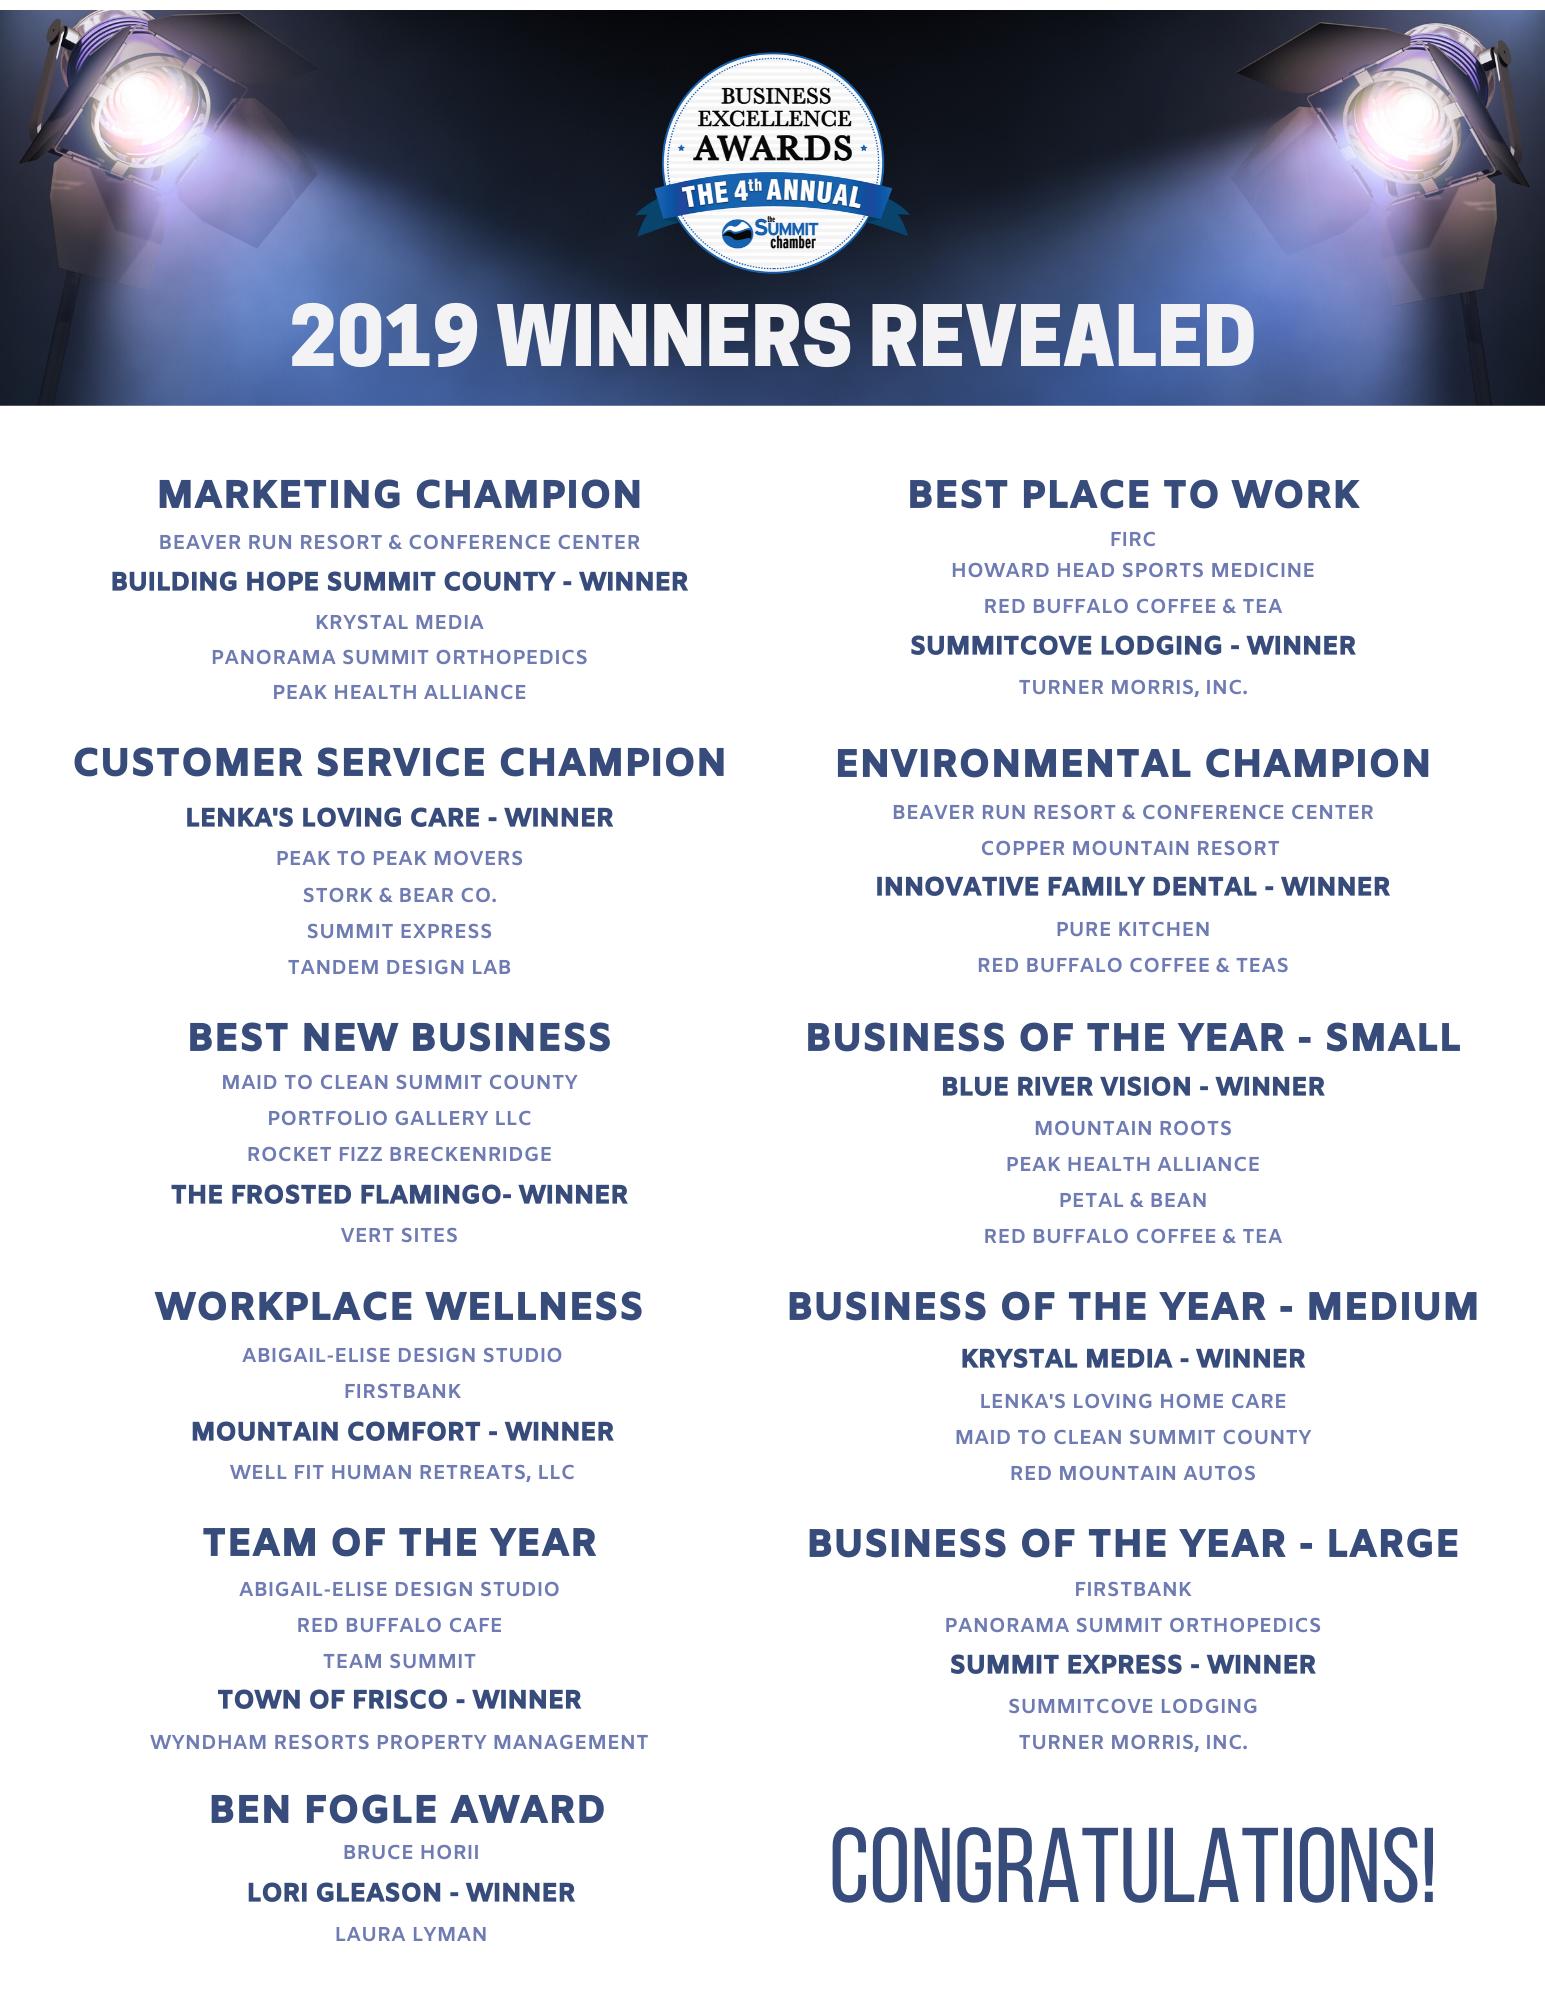 2019 Award Nominees